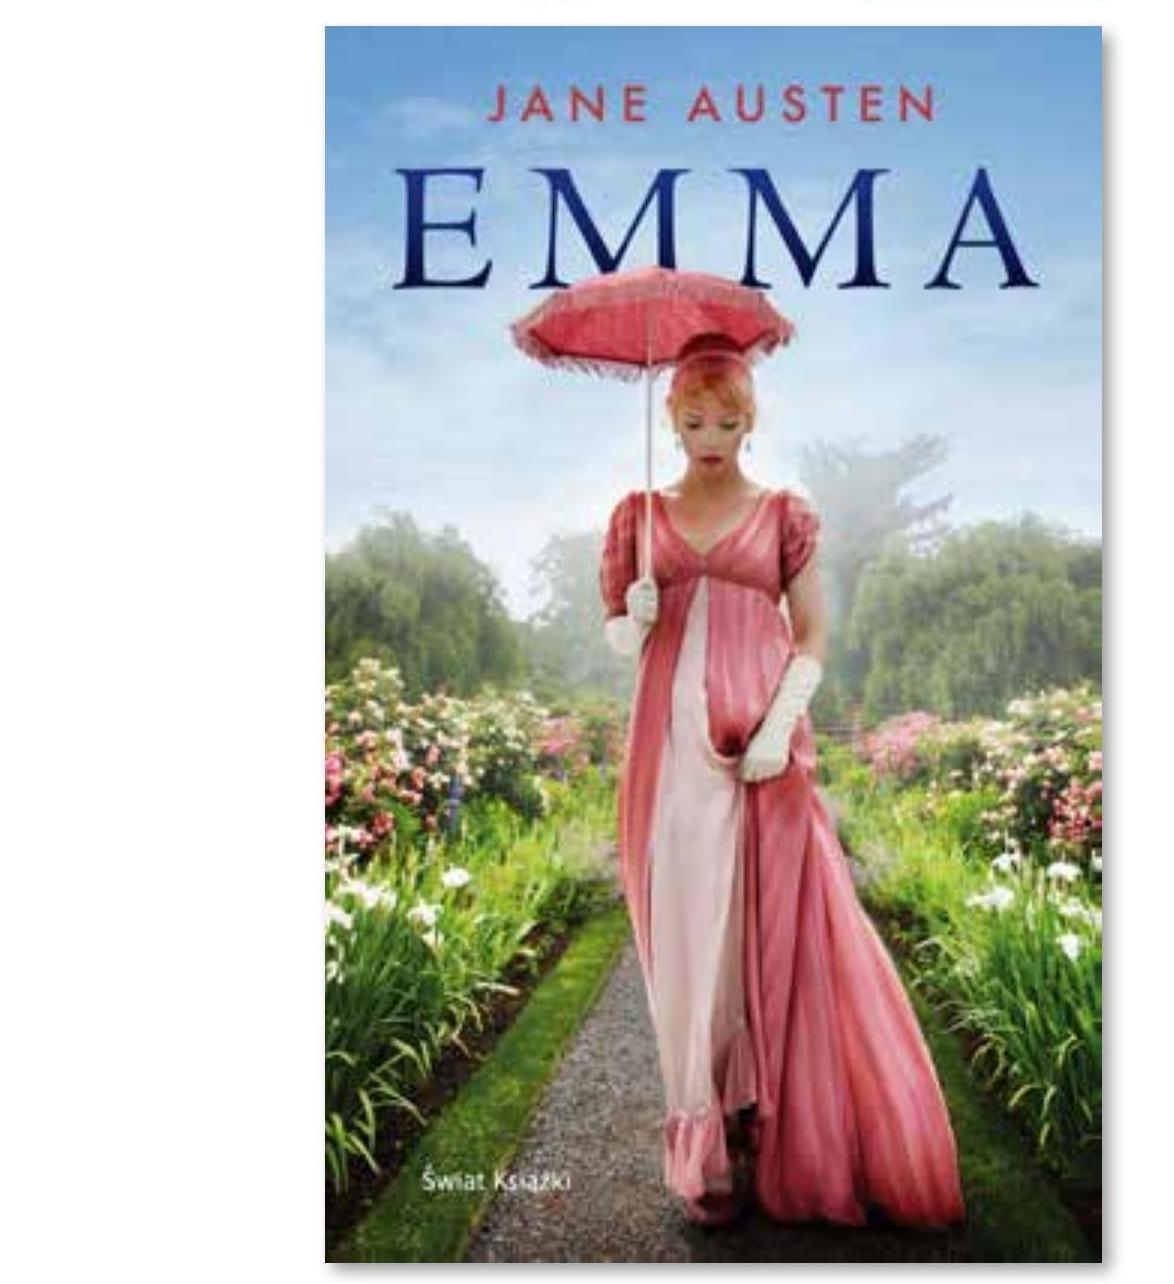 Emma Jane Austen niska cena